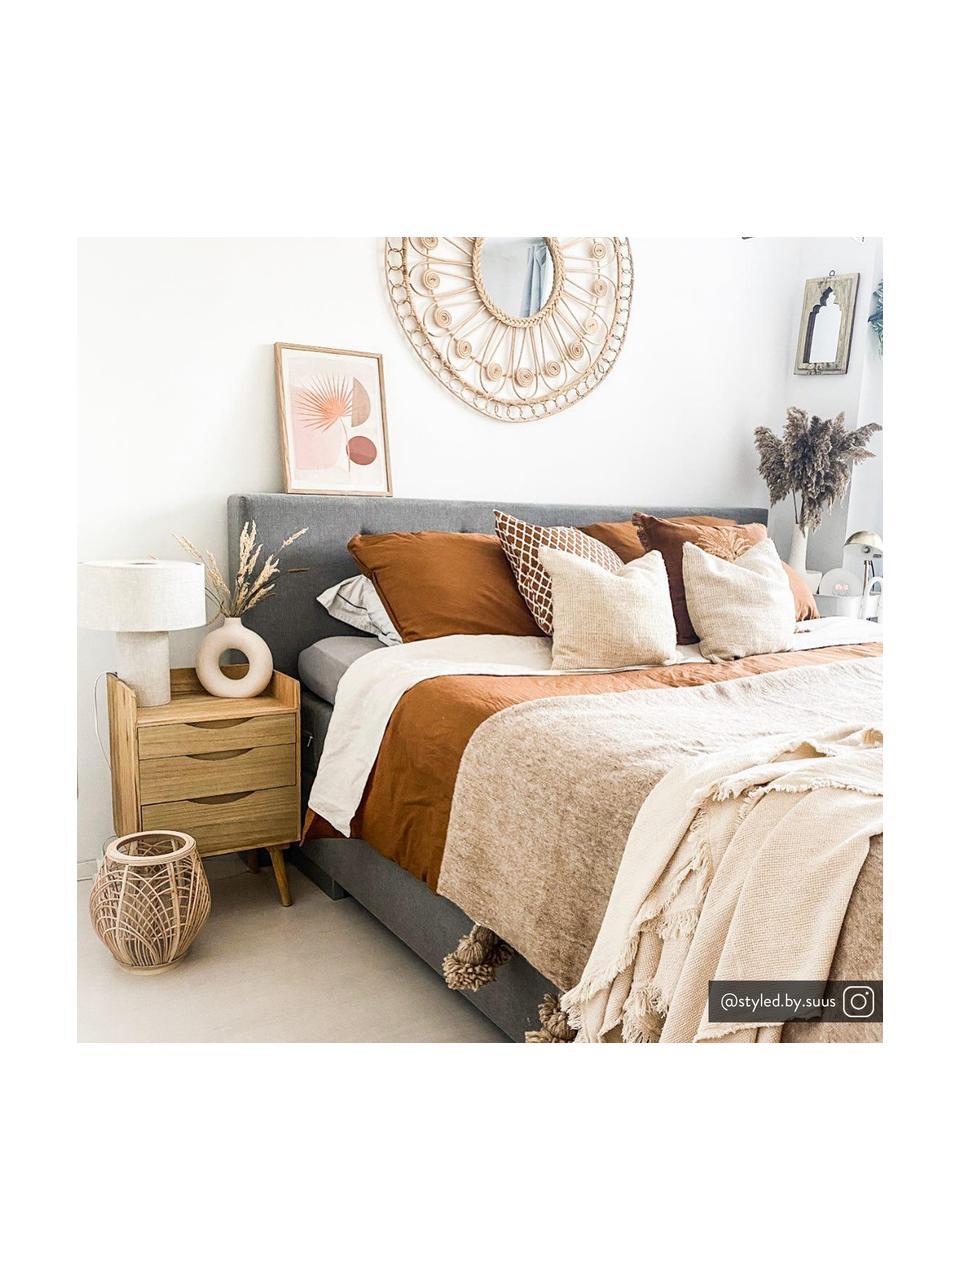 Tafellamp Ron in beige, Lampenkap: textiel, Lampvoet: textiel, Diffuser: textiel, Lampenkap: grijs. Lampvoet: grijs. Snoer: wit, Ø 30 x H 35 cm